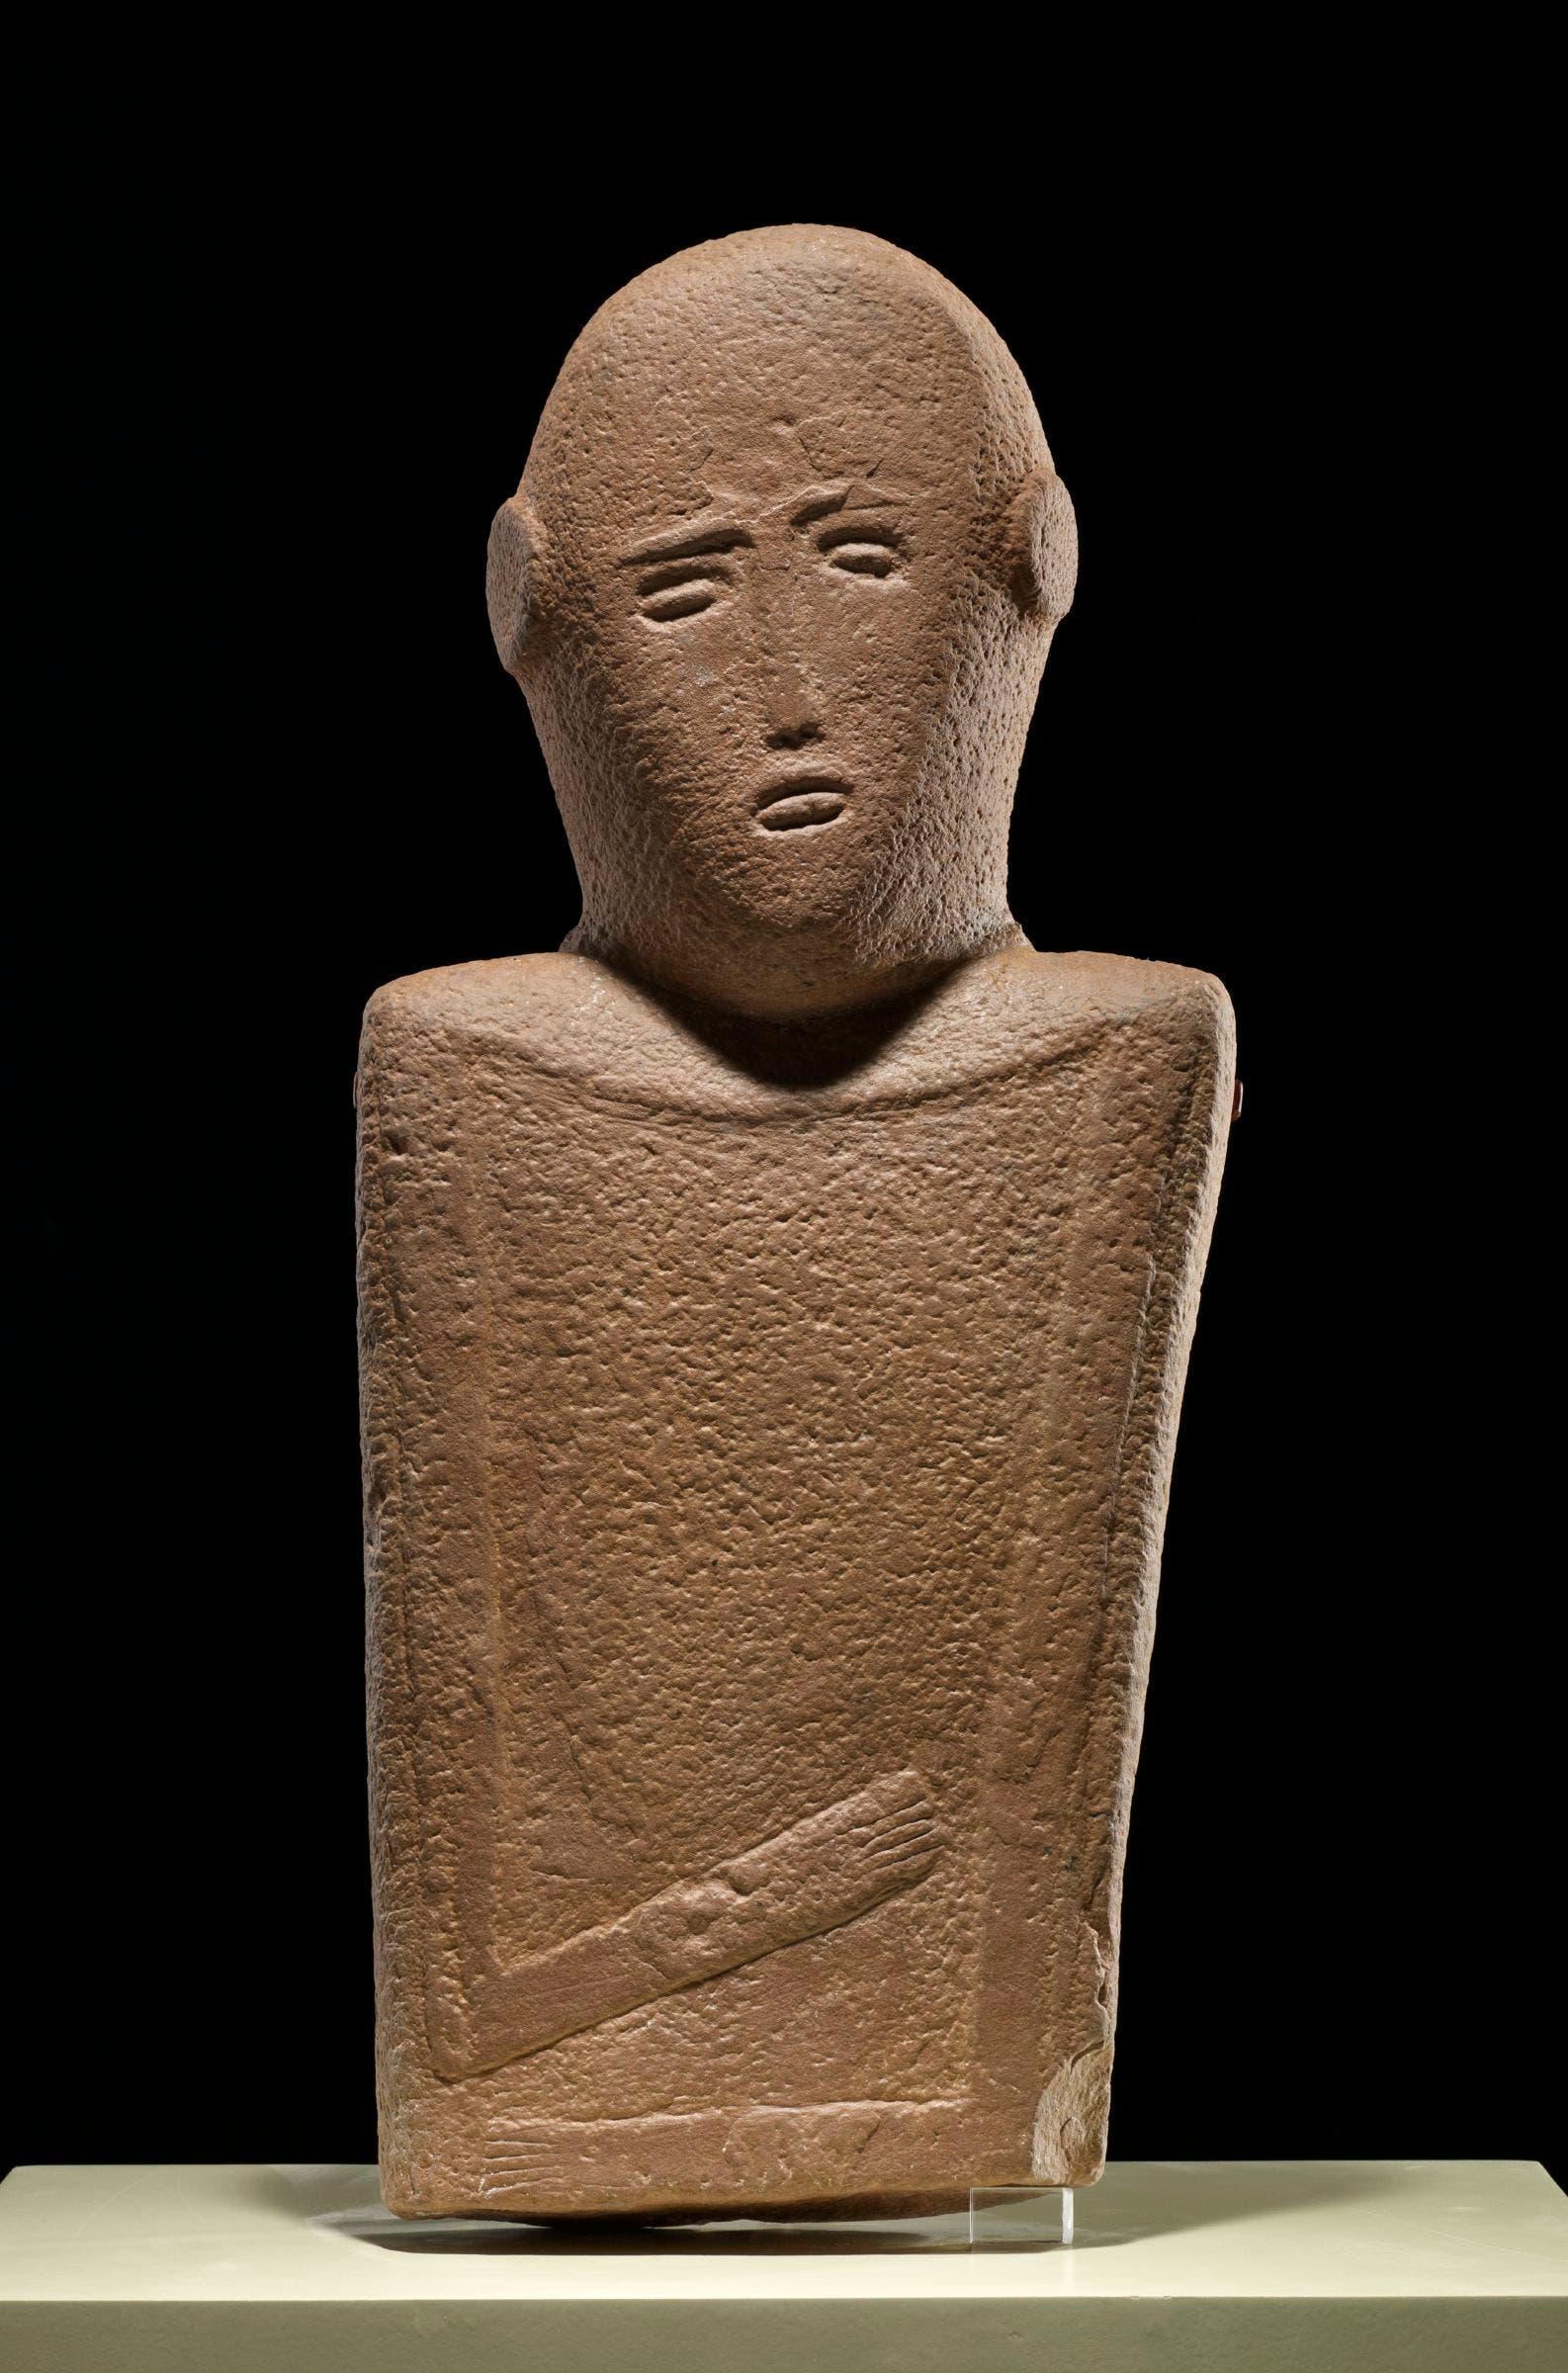 Anthropomorphic Stele, El-Maakir, Qaryat al-Kaafa, near Hau2019il, Saudi Arabia, 4th millennium BC, sandstone, National Museum, Riyadh